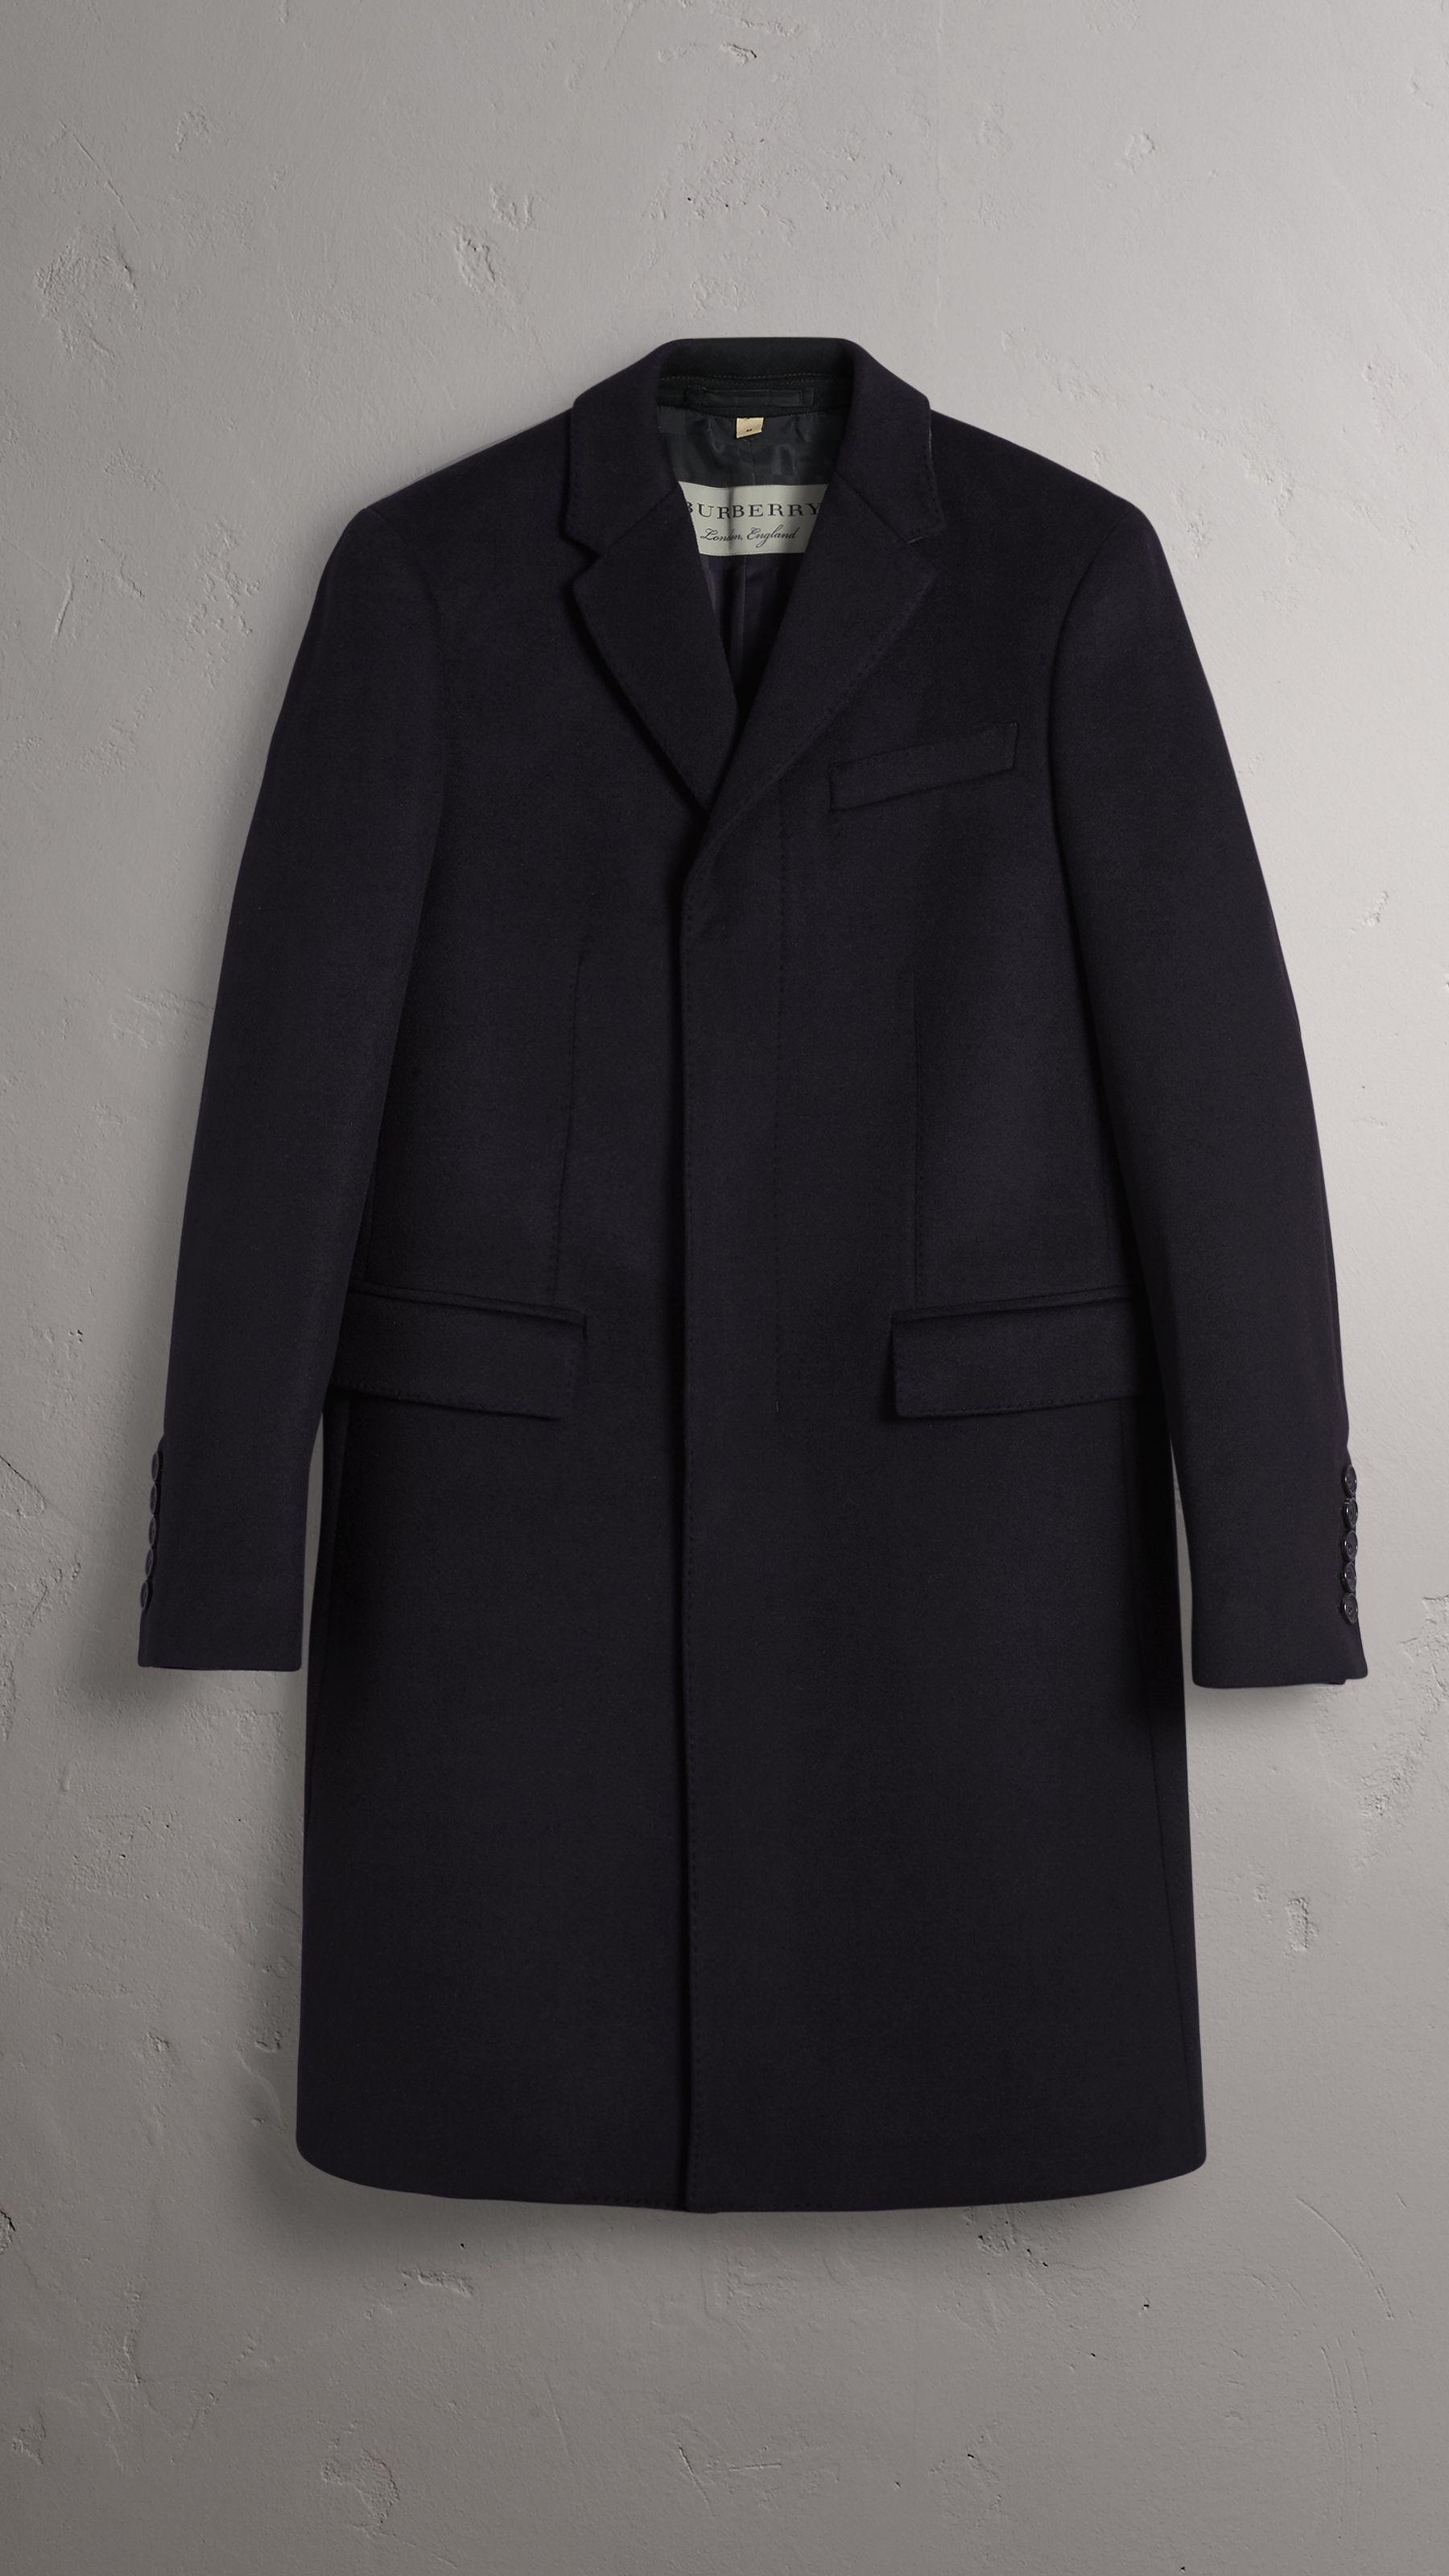 Hombre de en cachemir Marino Azul y lana vestir Abrigo 8Tqa4wTZ